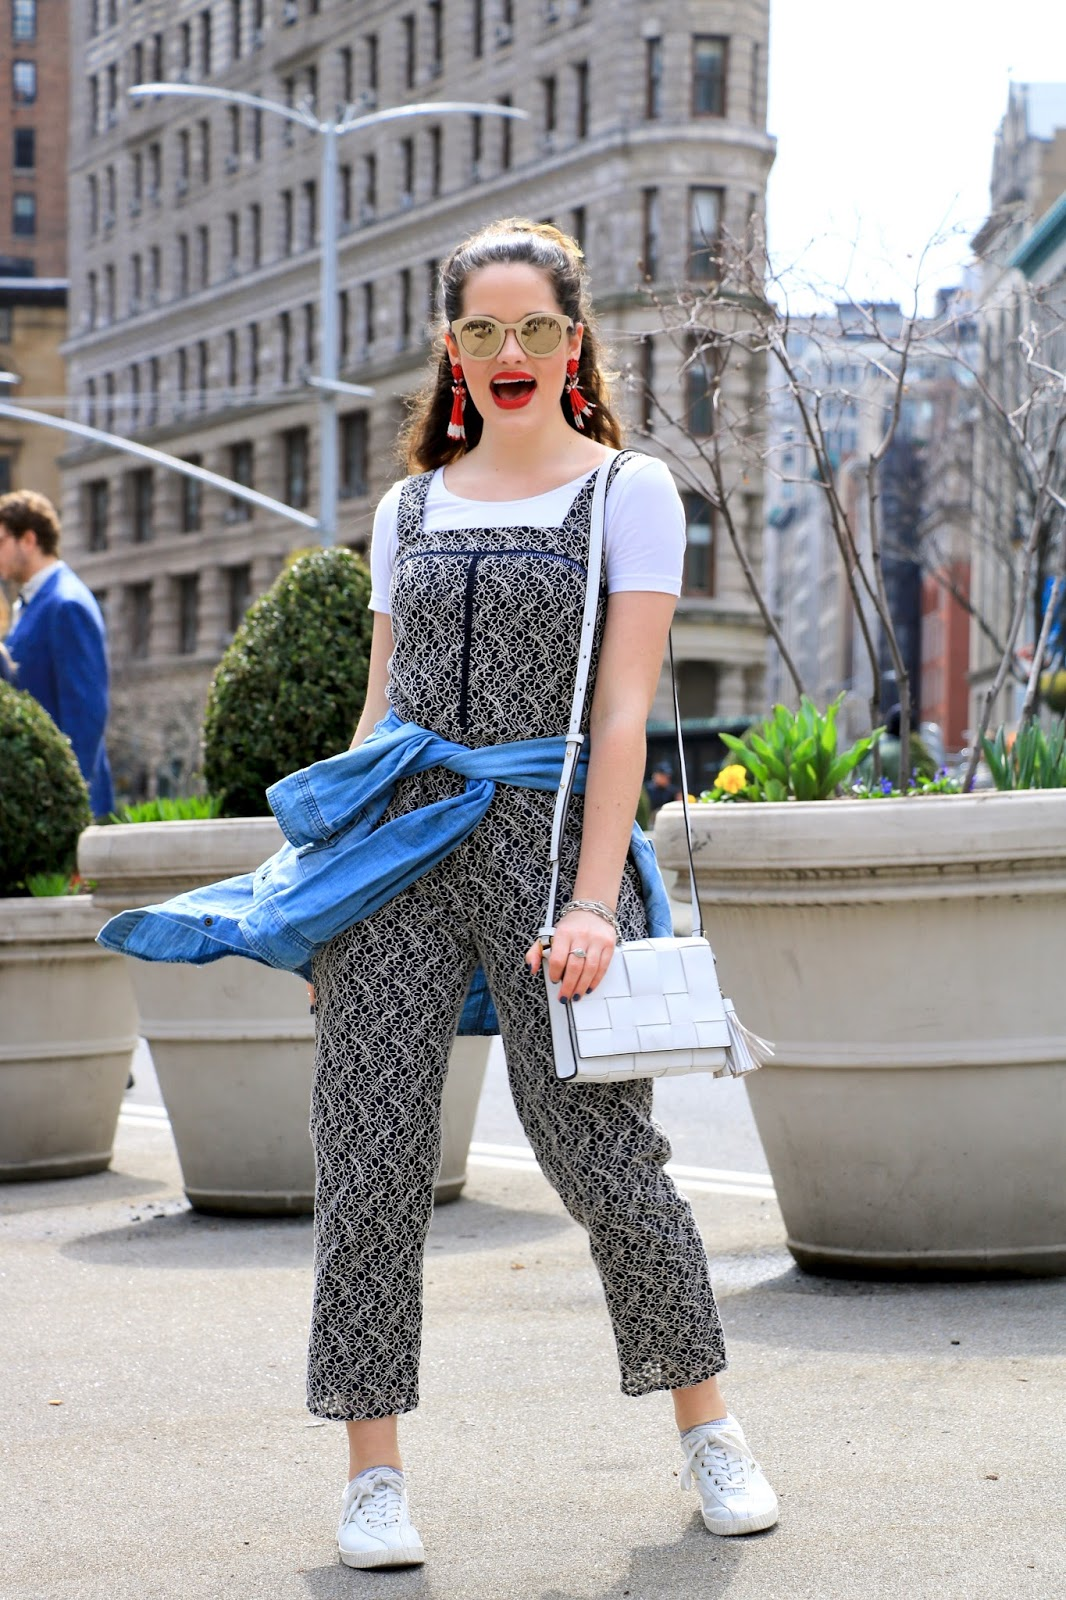 Nyc fashion blogger Kathleen Harper's spring fashion ideas